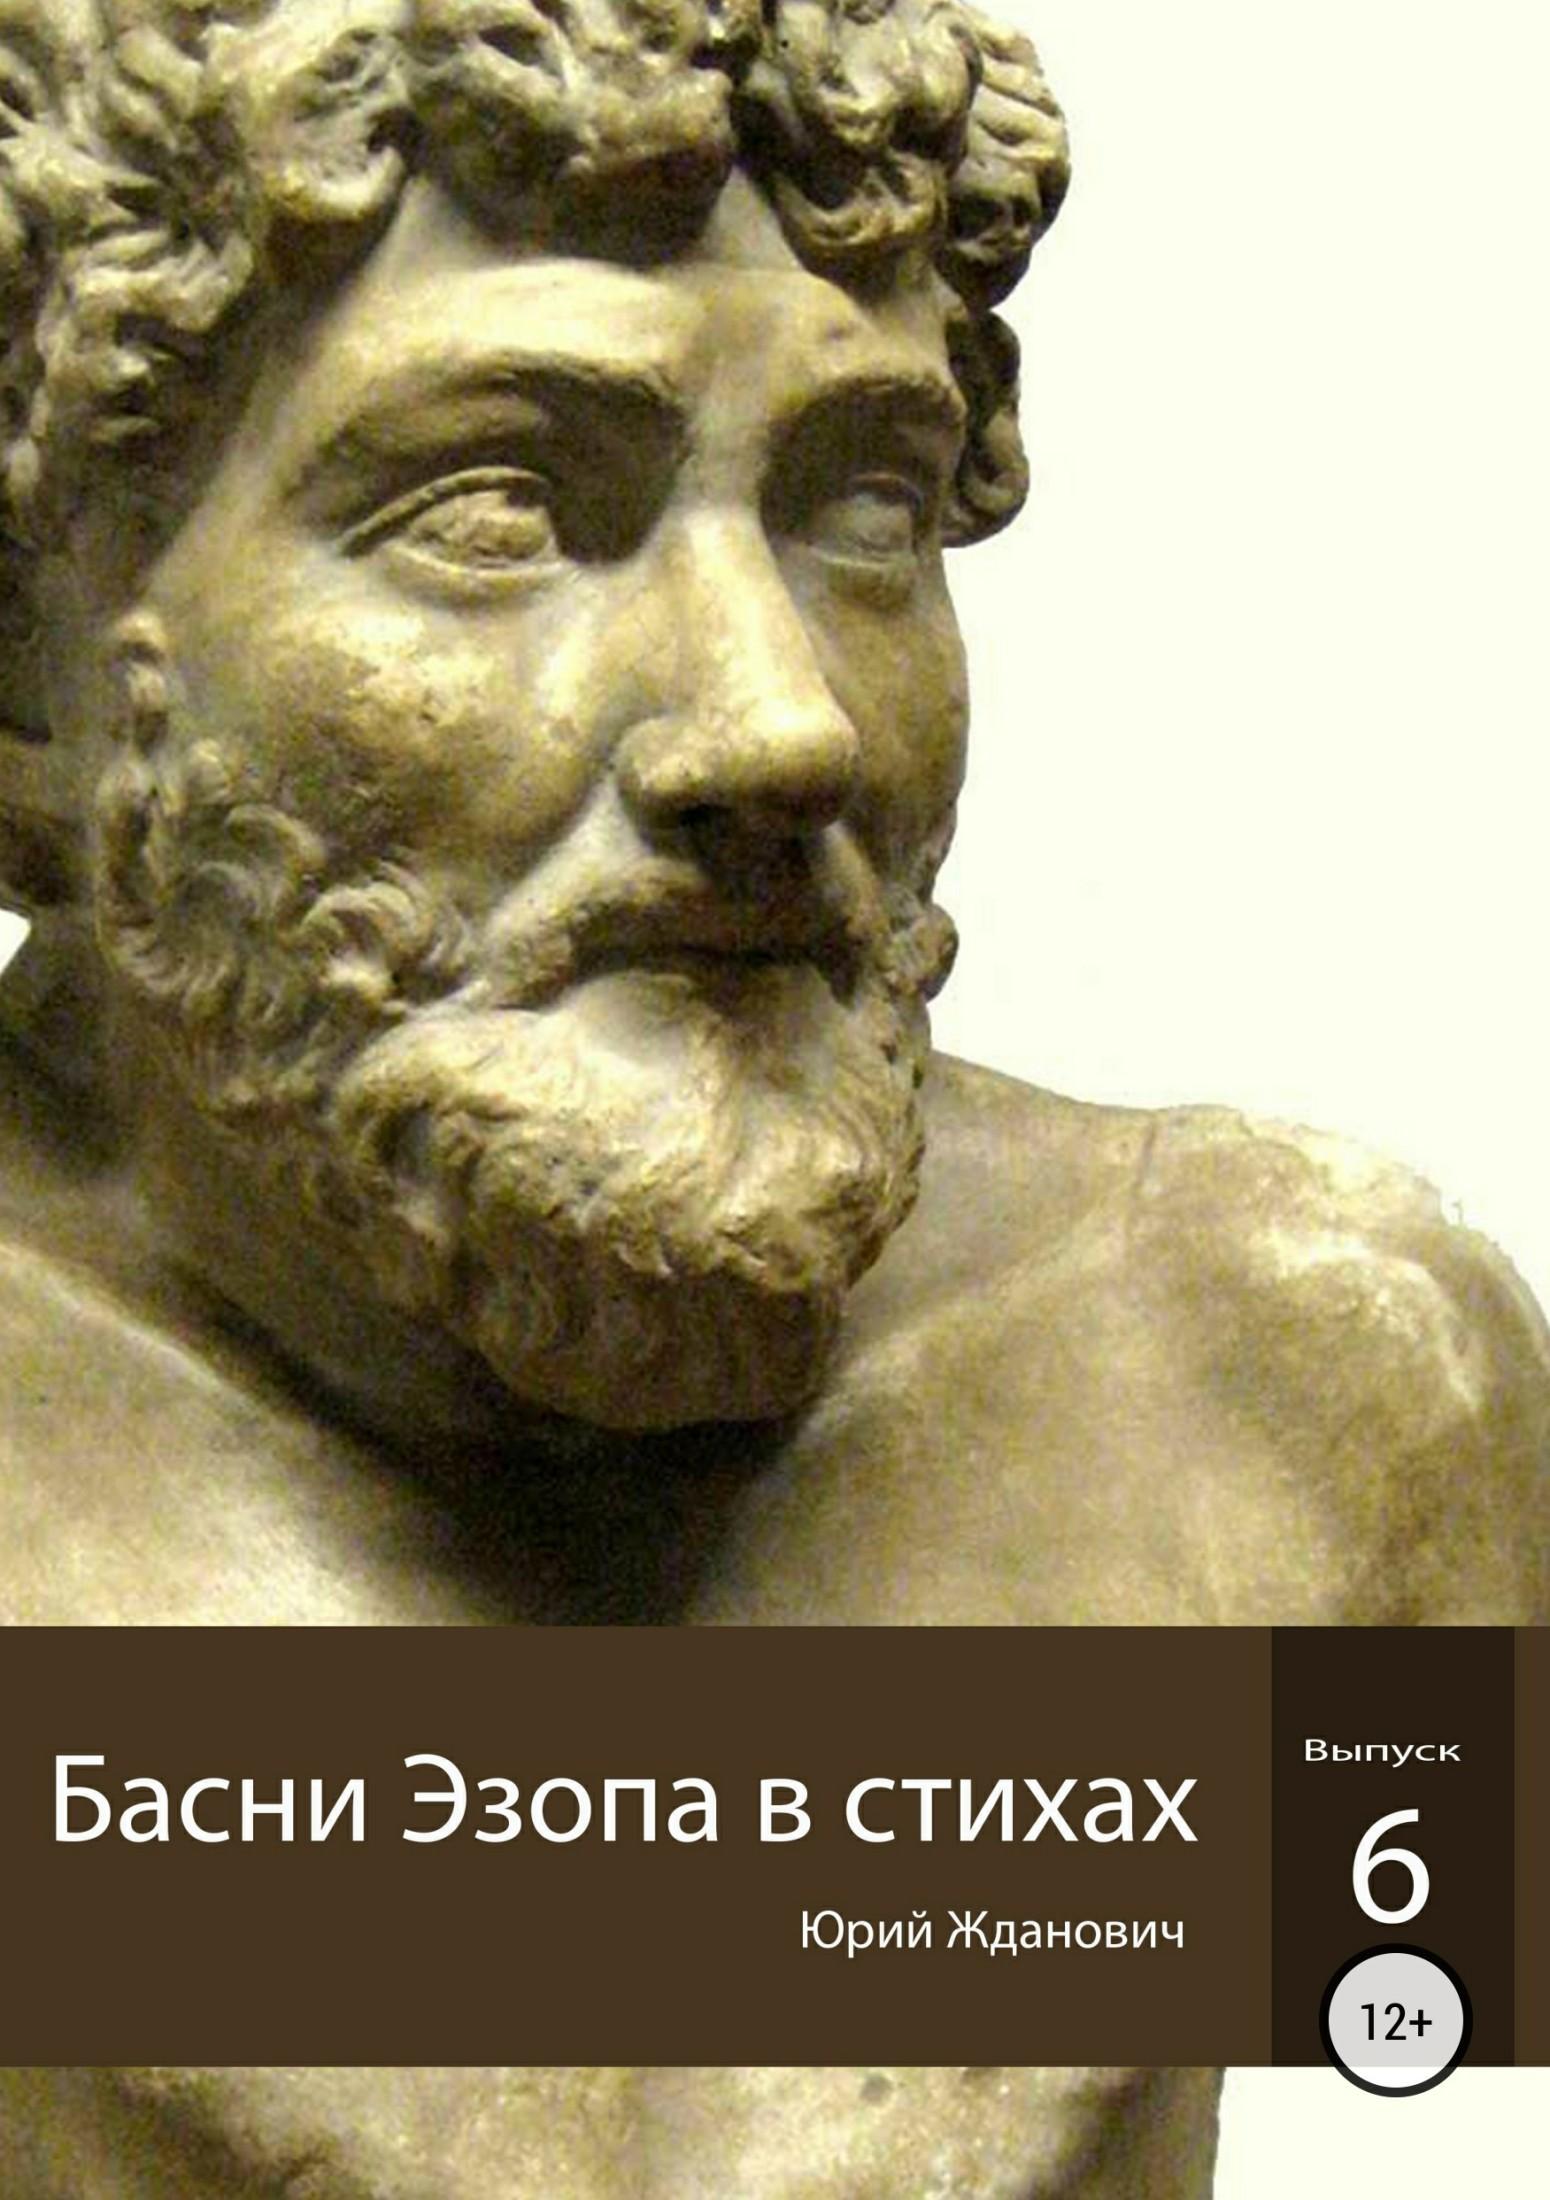 Юрий Михайлович Жданович Басни Эзопа в стихах. Выпуск 6 мастер класс басни с моралью